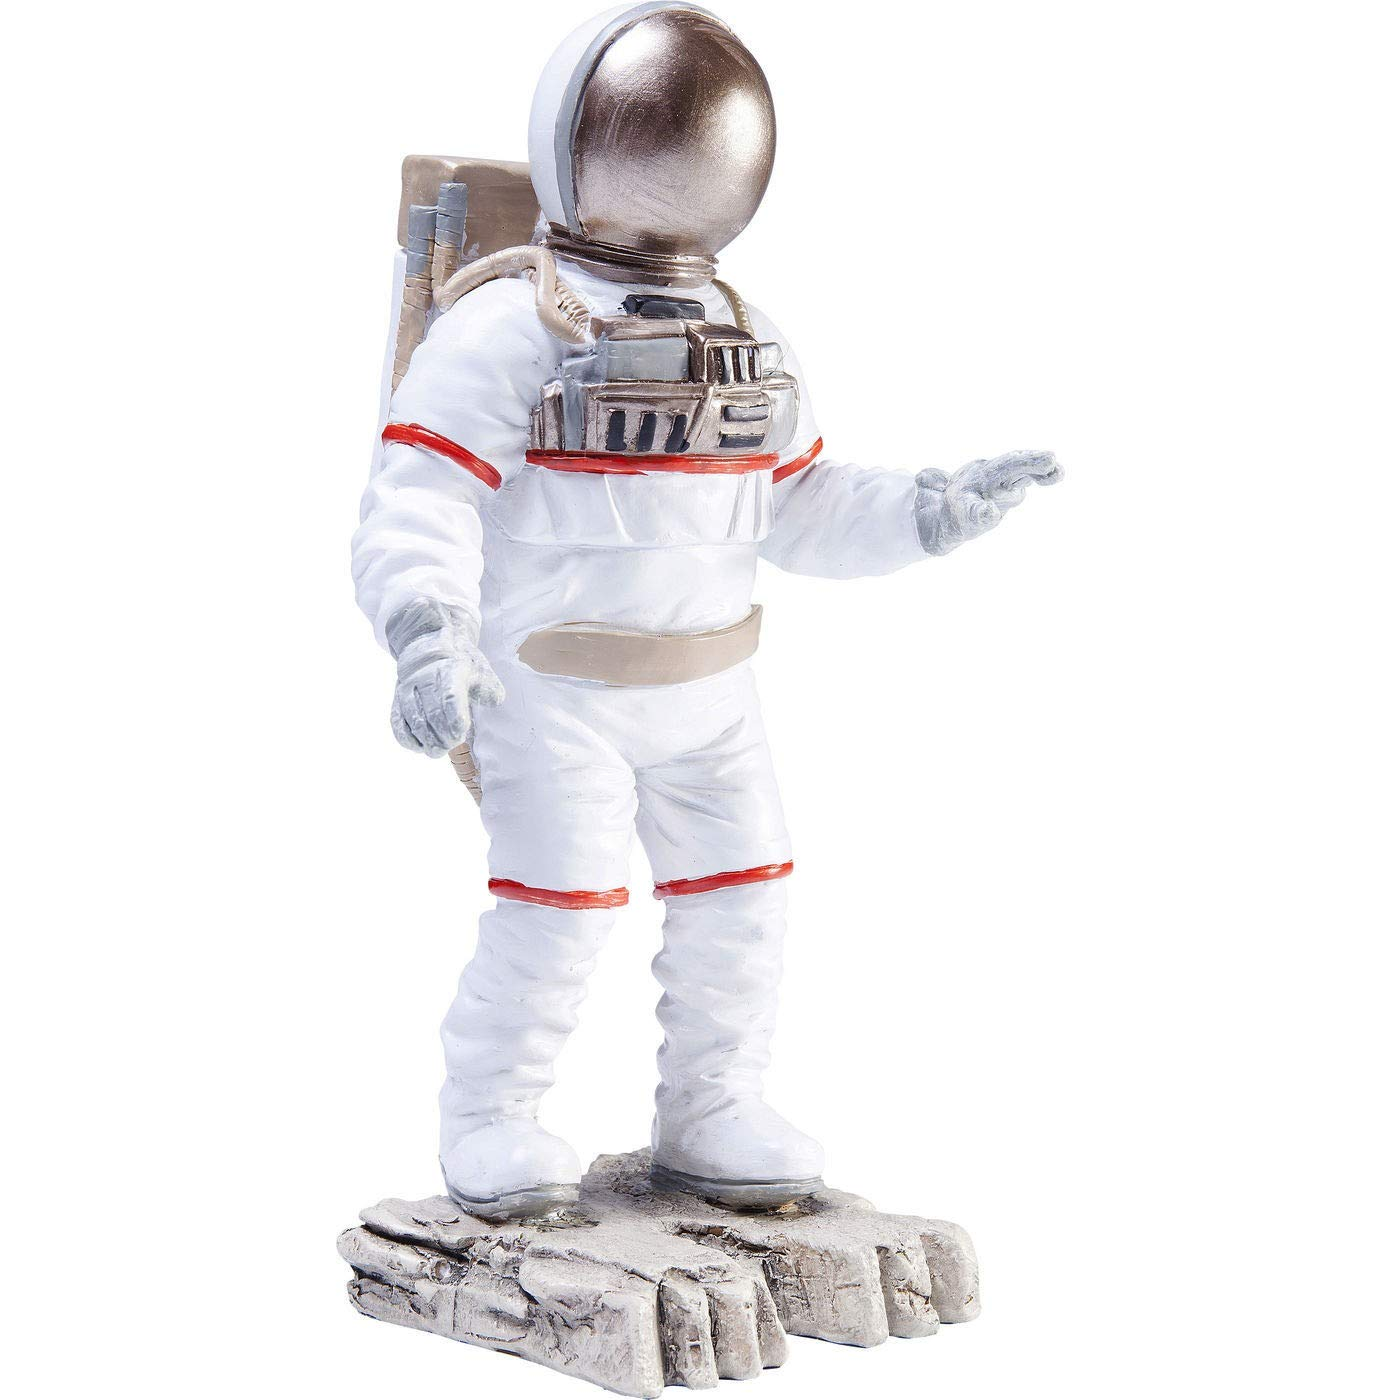 Figurine d/écorative Astronaute Blanc Moon 23 cm Kare Design